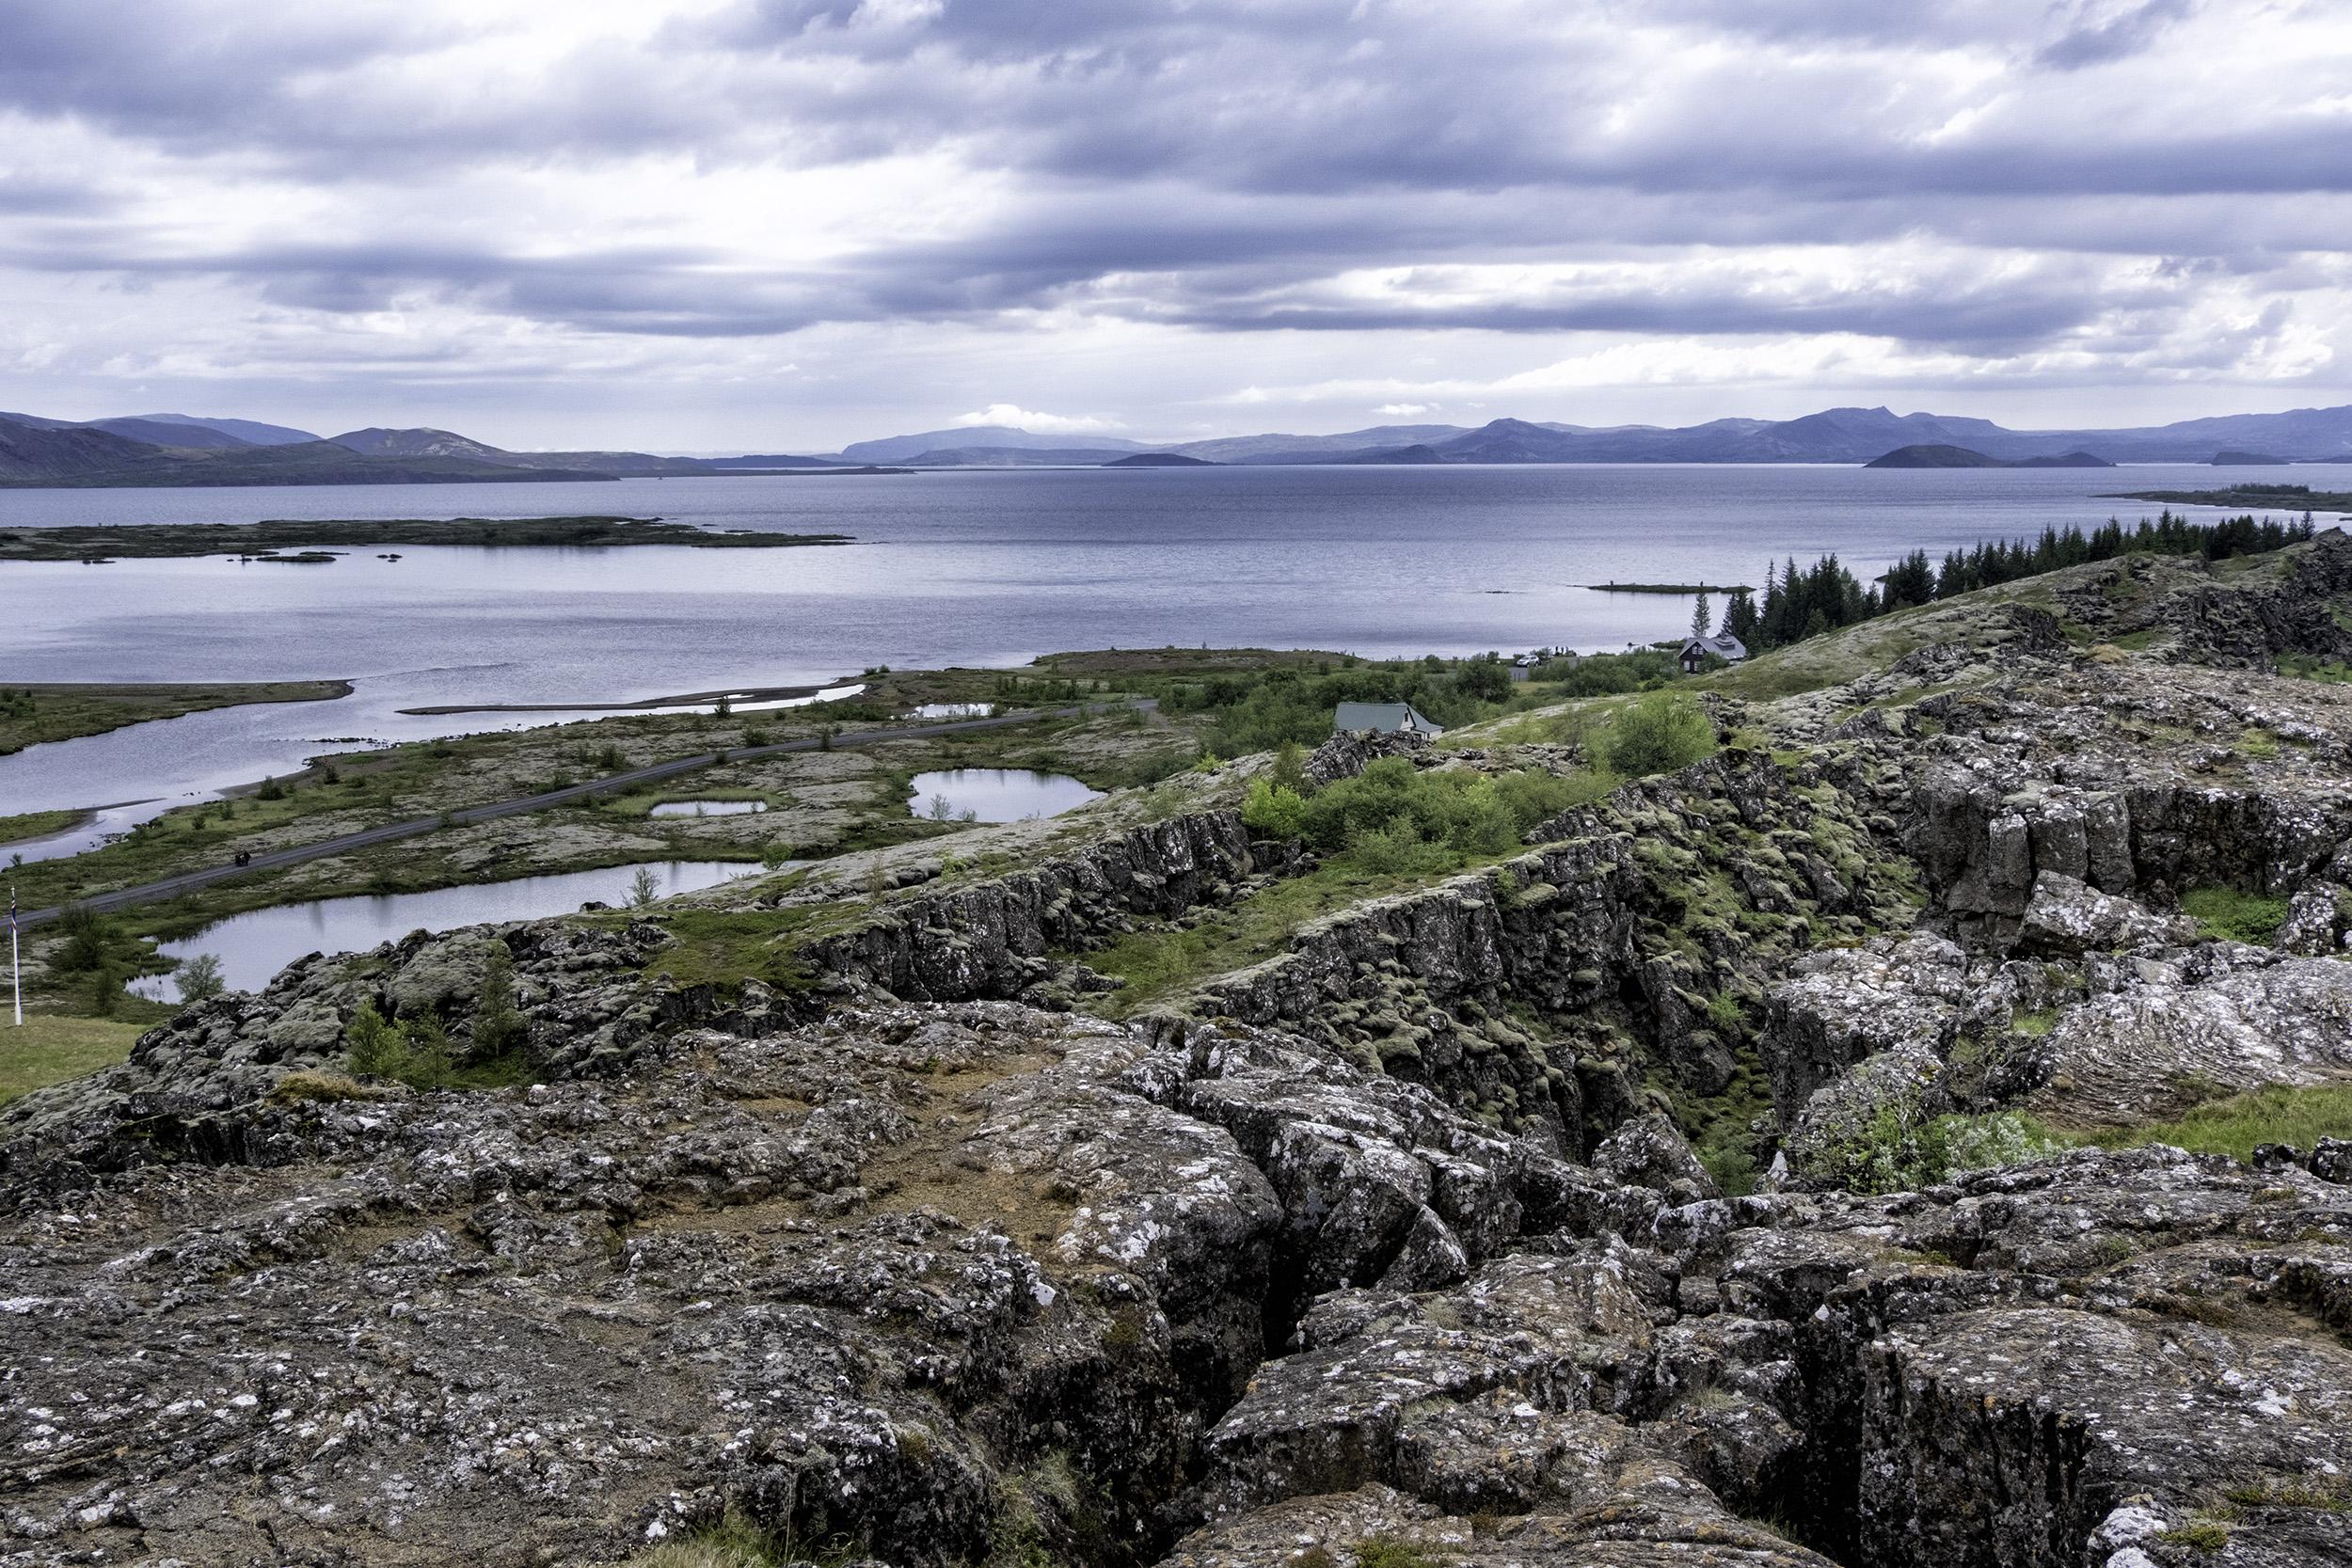 Þingvellir Park and Lake Þingvallavatn